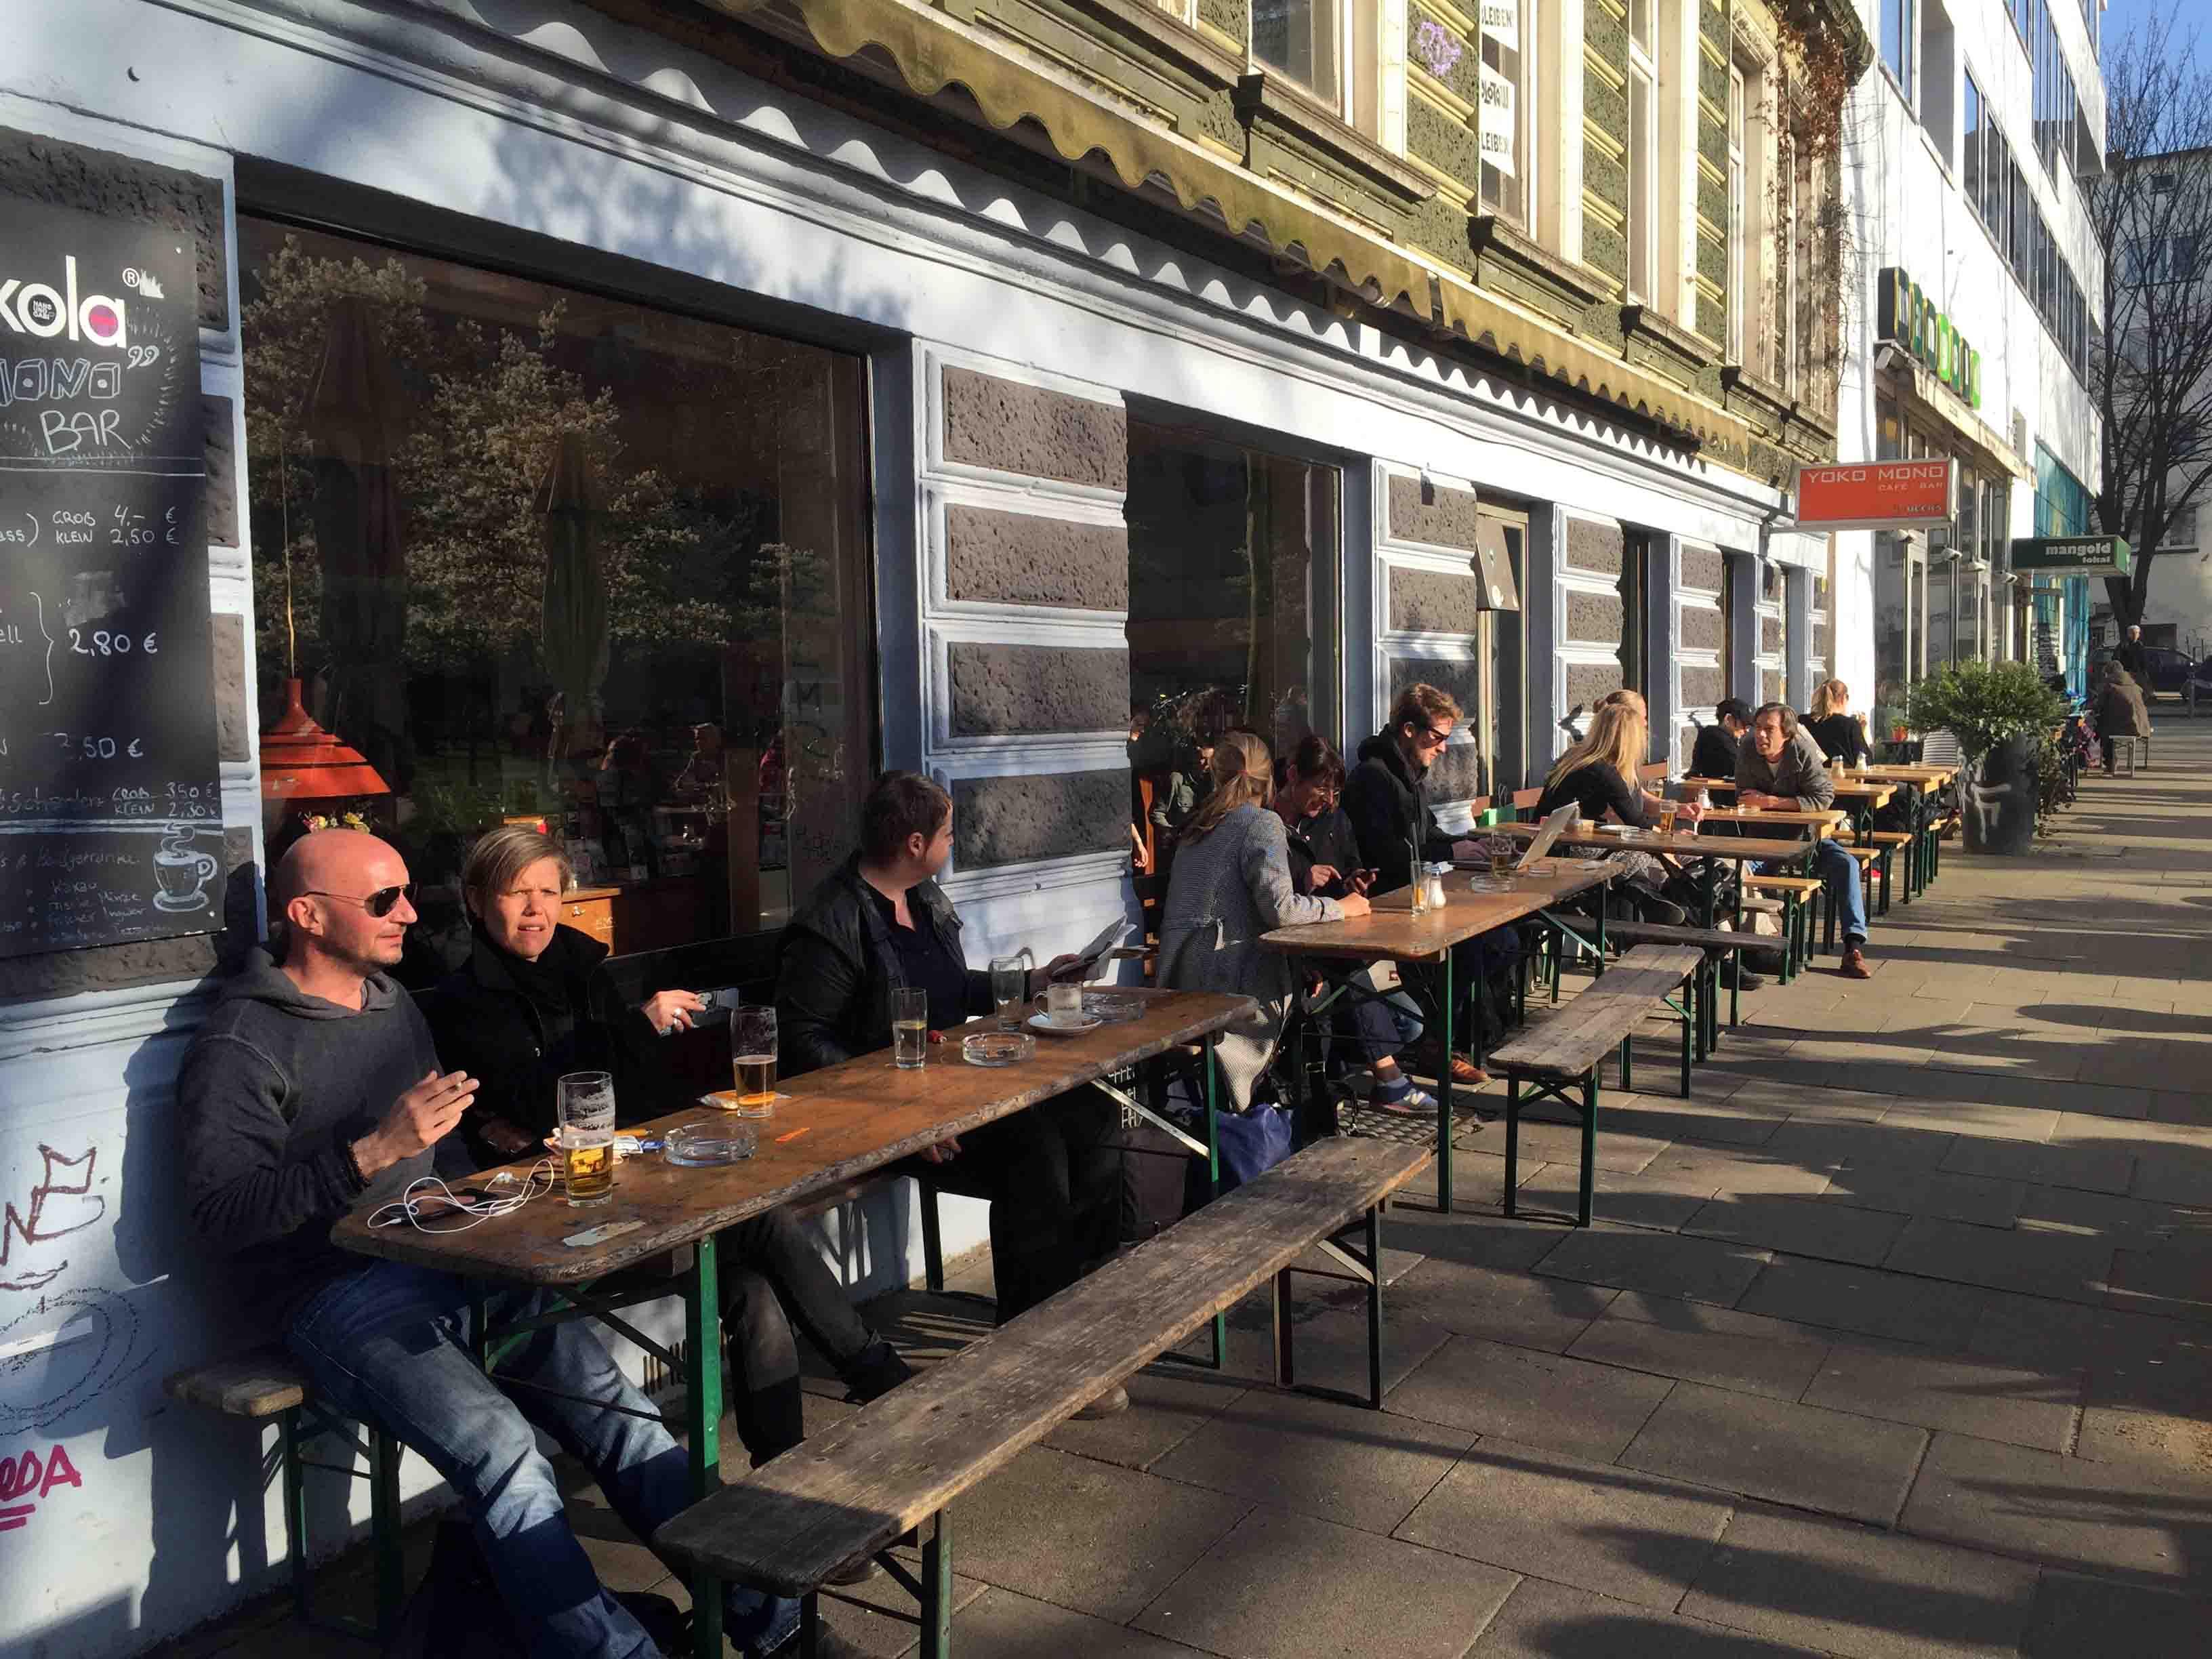 chilling_beer_street